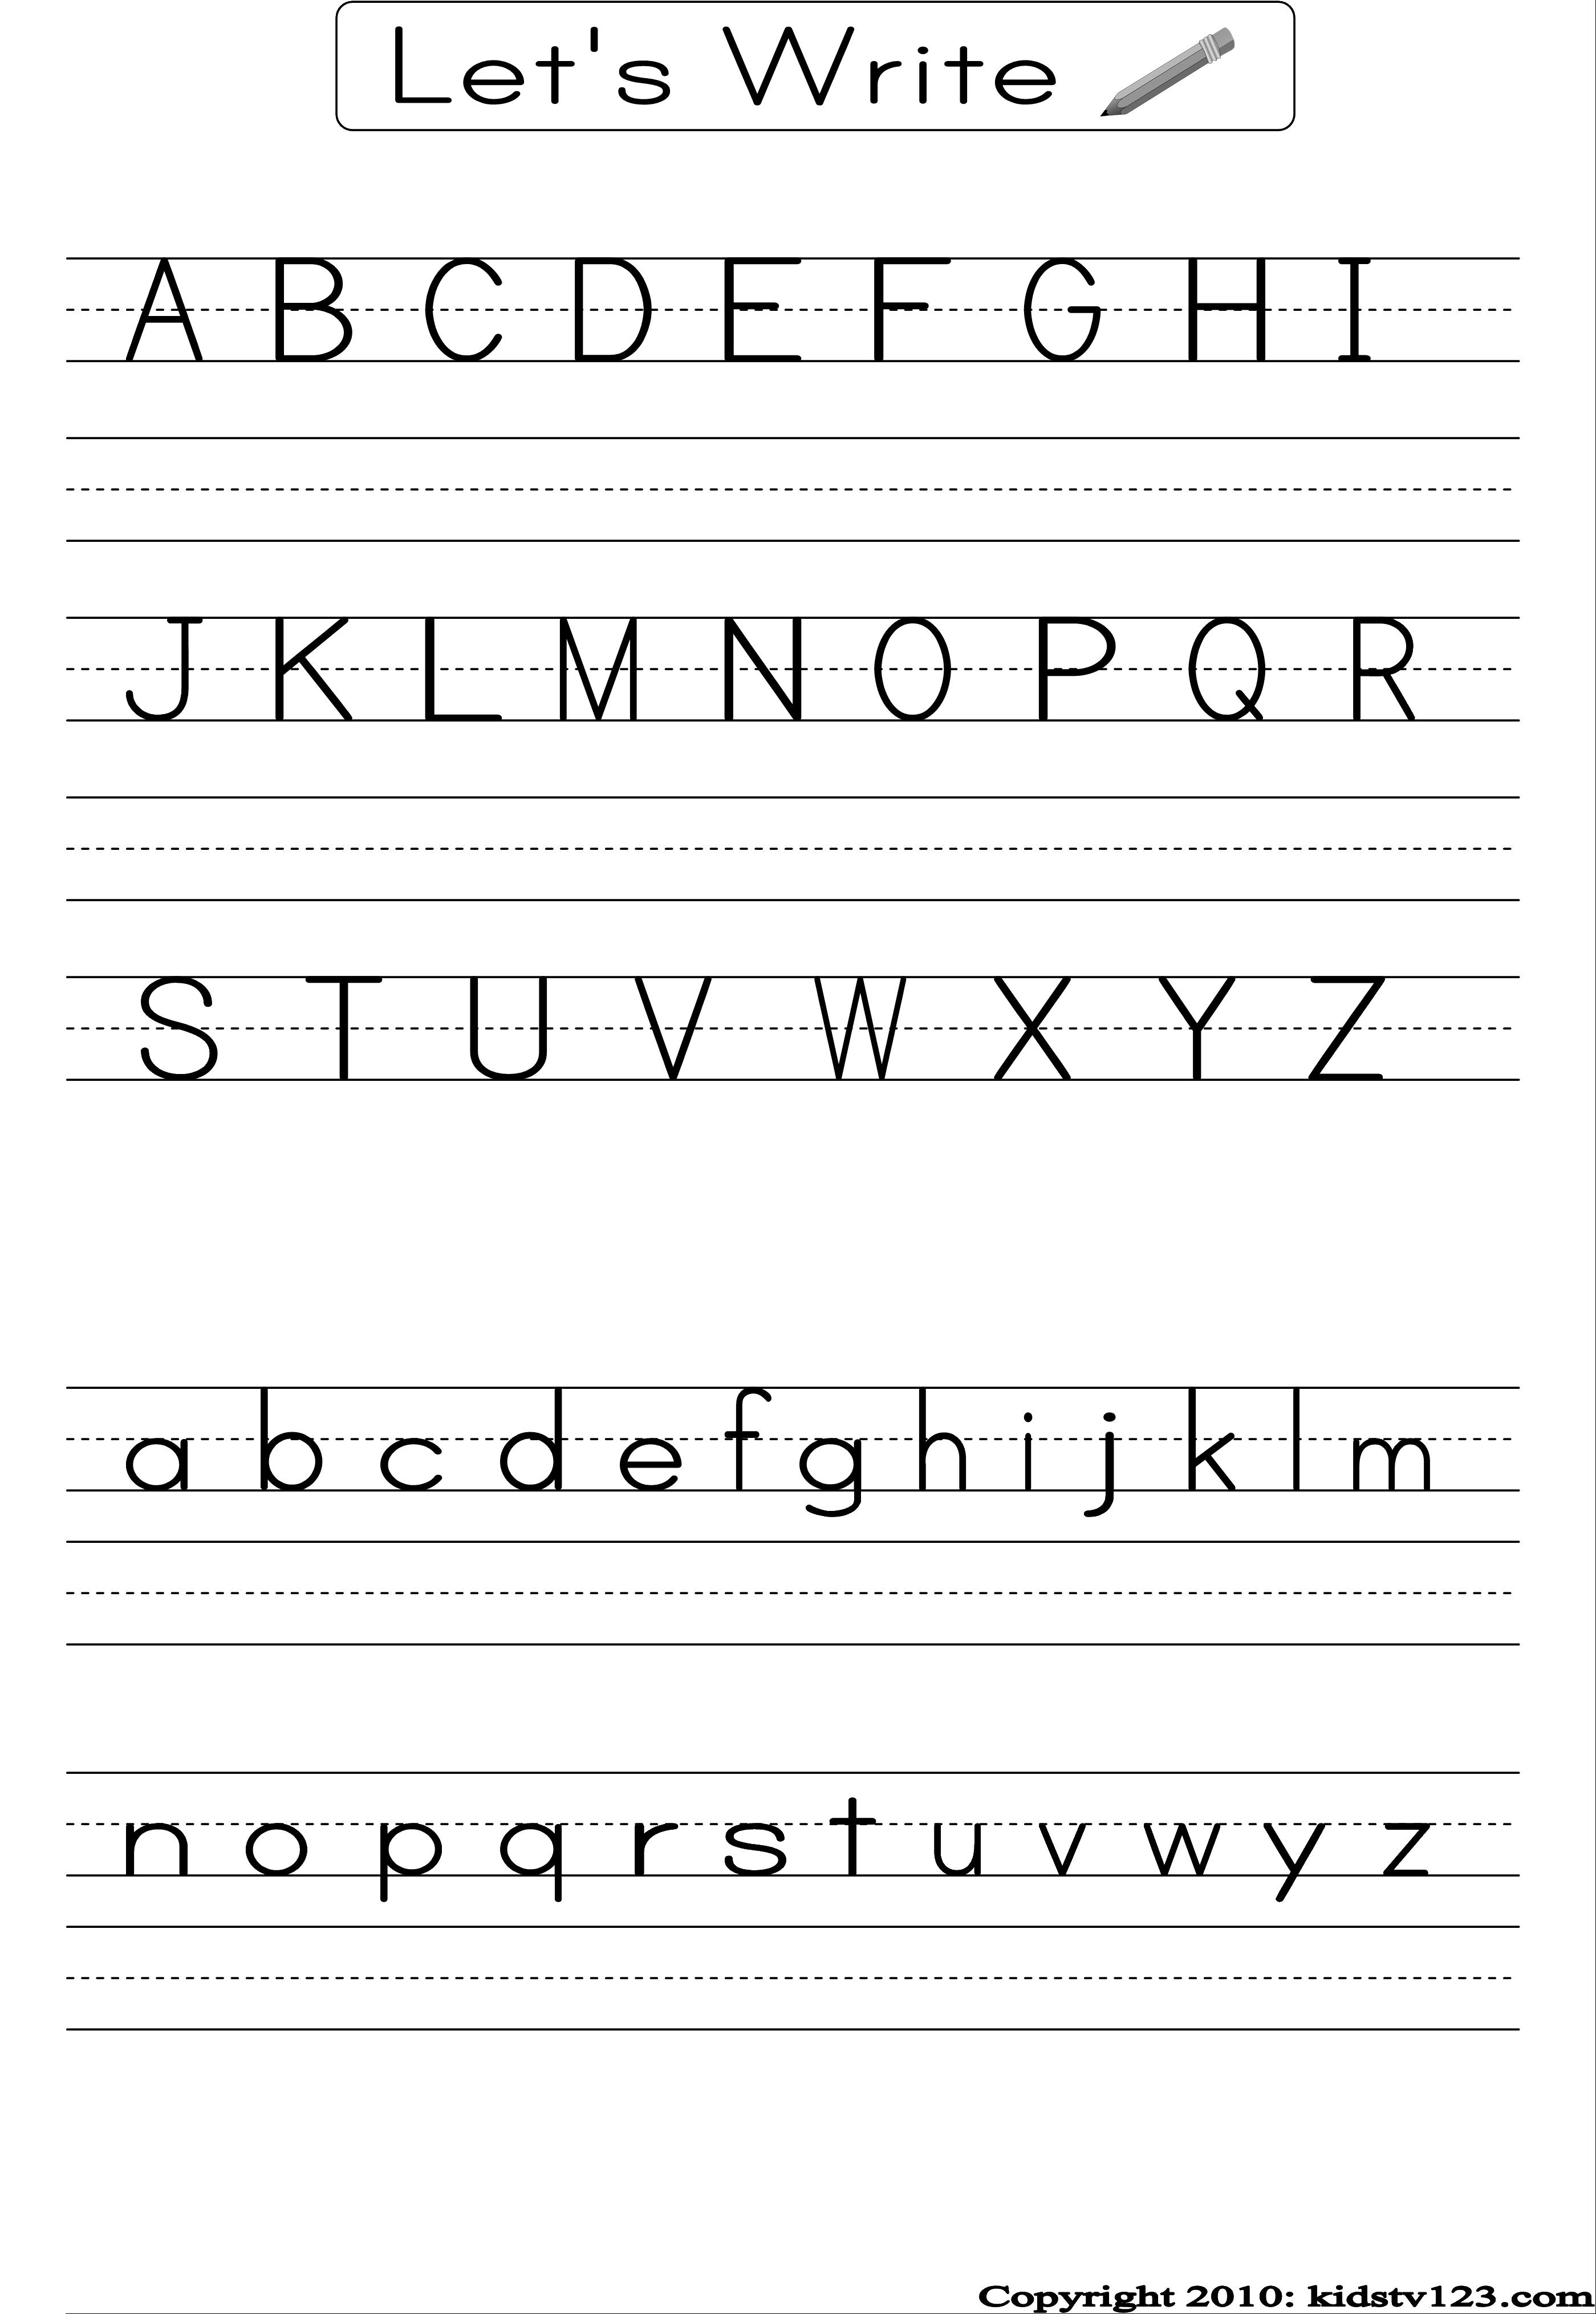 Alphabet Writing Practice Sheet | Edu-Fun | Alphabet Worksheets | Free Printable Writing Worksheets For Kindergarten